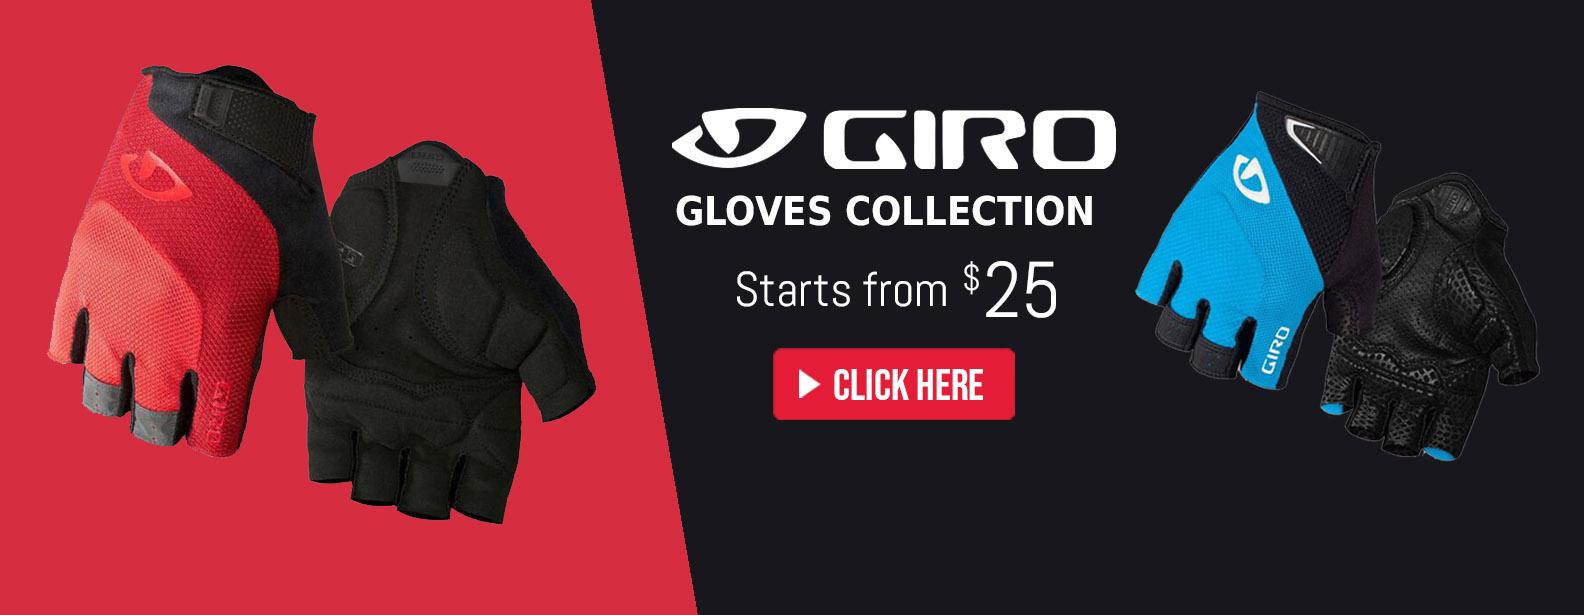 Buy Giro Glove Collection